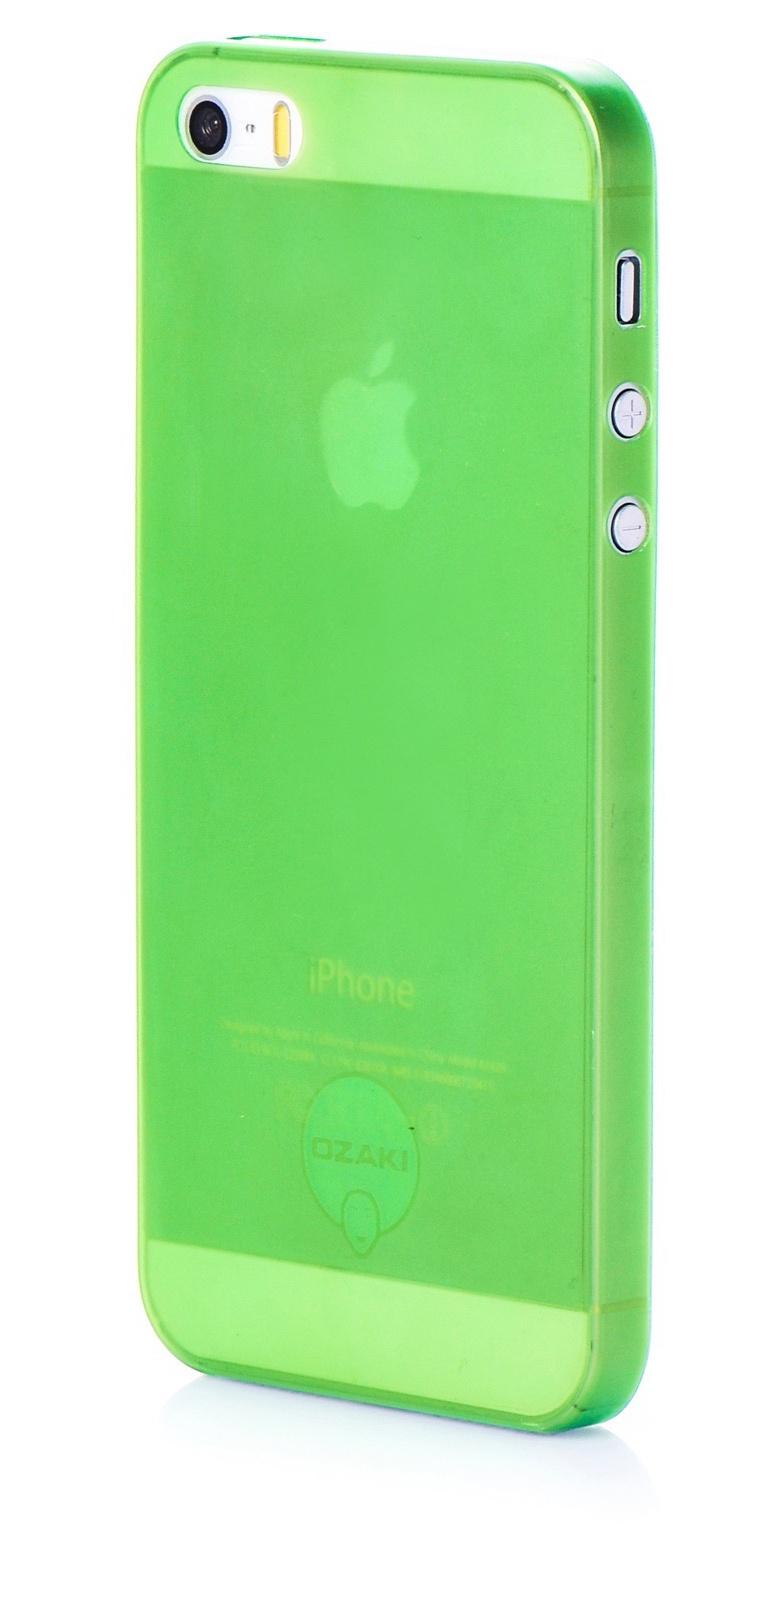 Чехол для сотового телефона Ozaki накладка пластик 0.3мм g для Apple iPhone 5/5S/SE, зеленый